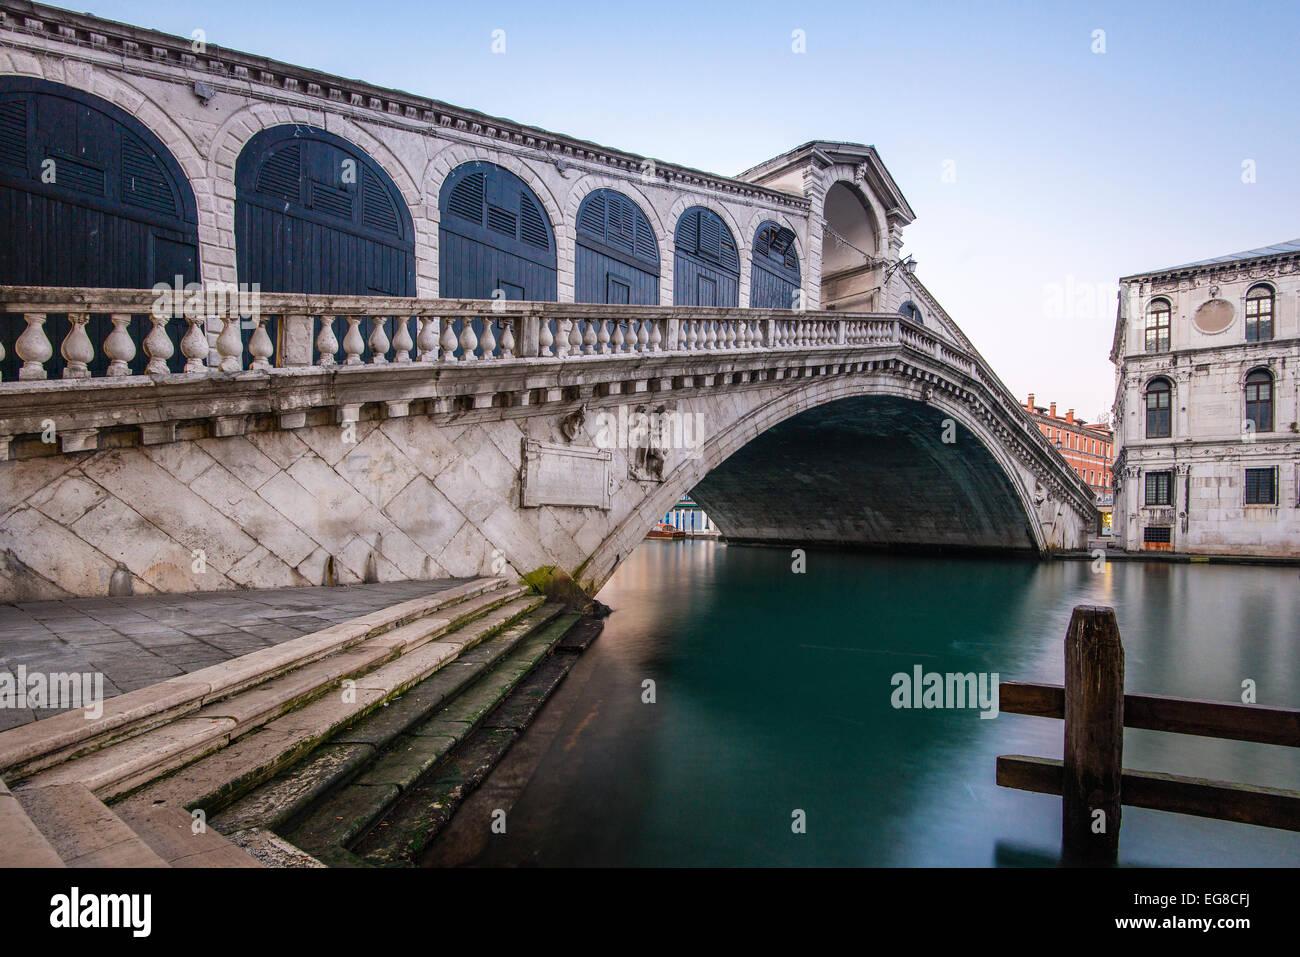 Rialto-Brücke in der Morgendämmerung, Venedig, Veneto, Italien Stockbild